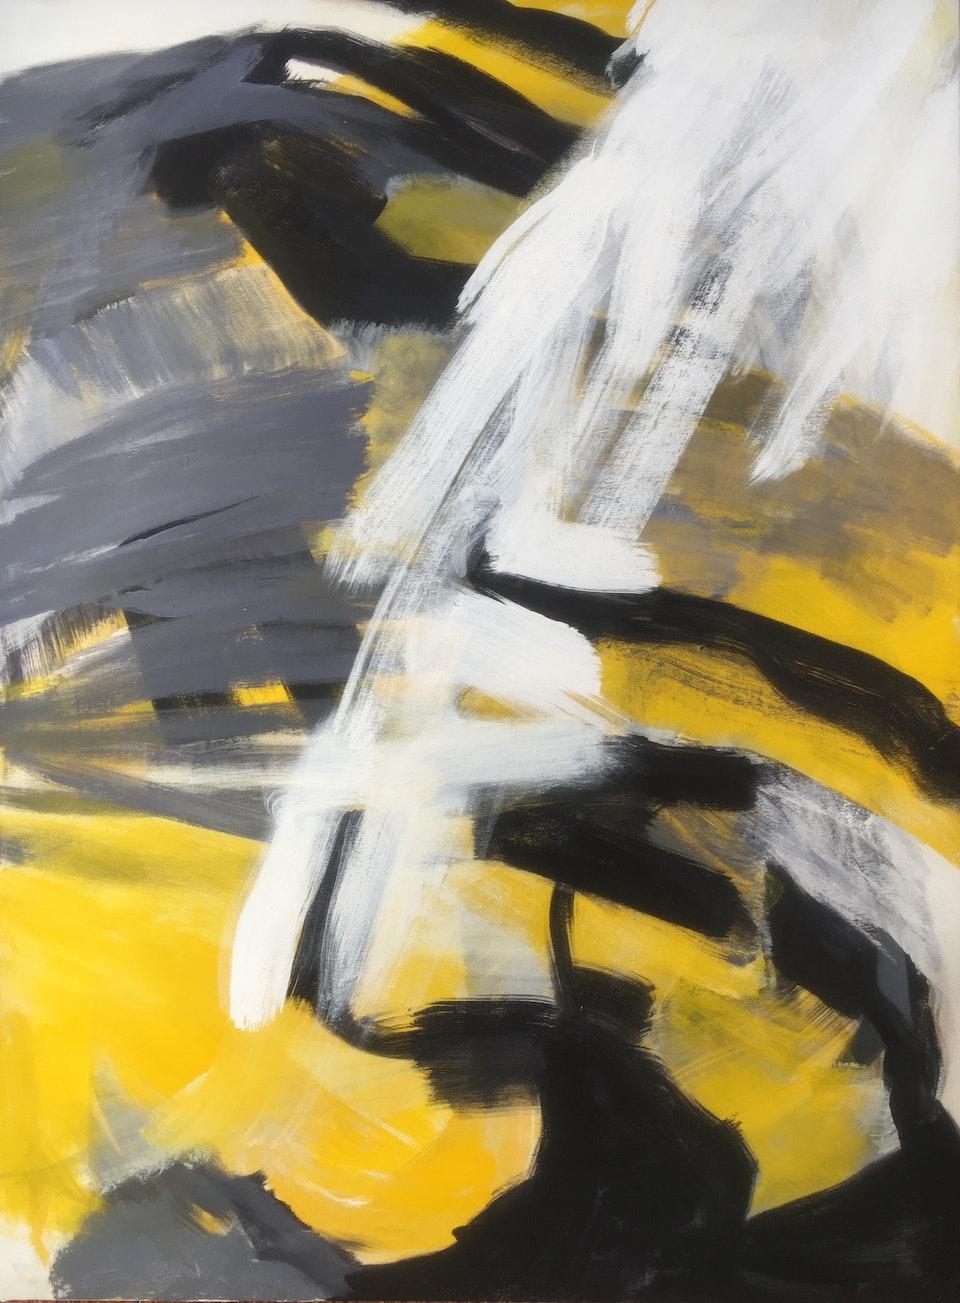 KAM-TJA (metall) - KAM- RLUNG (luft/vind) 130 x 97 cm